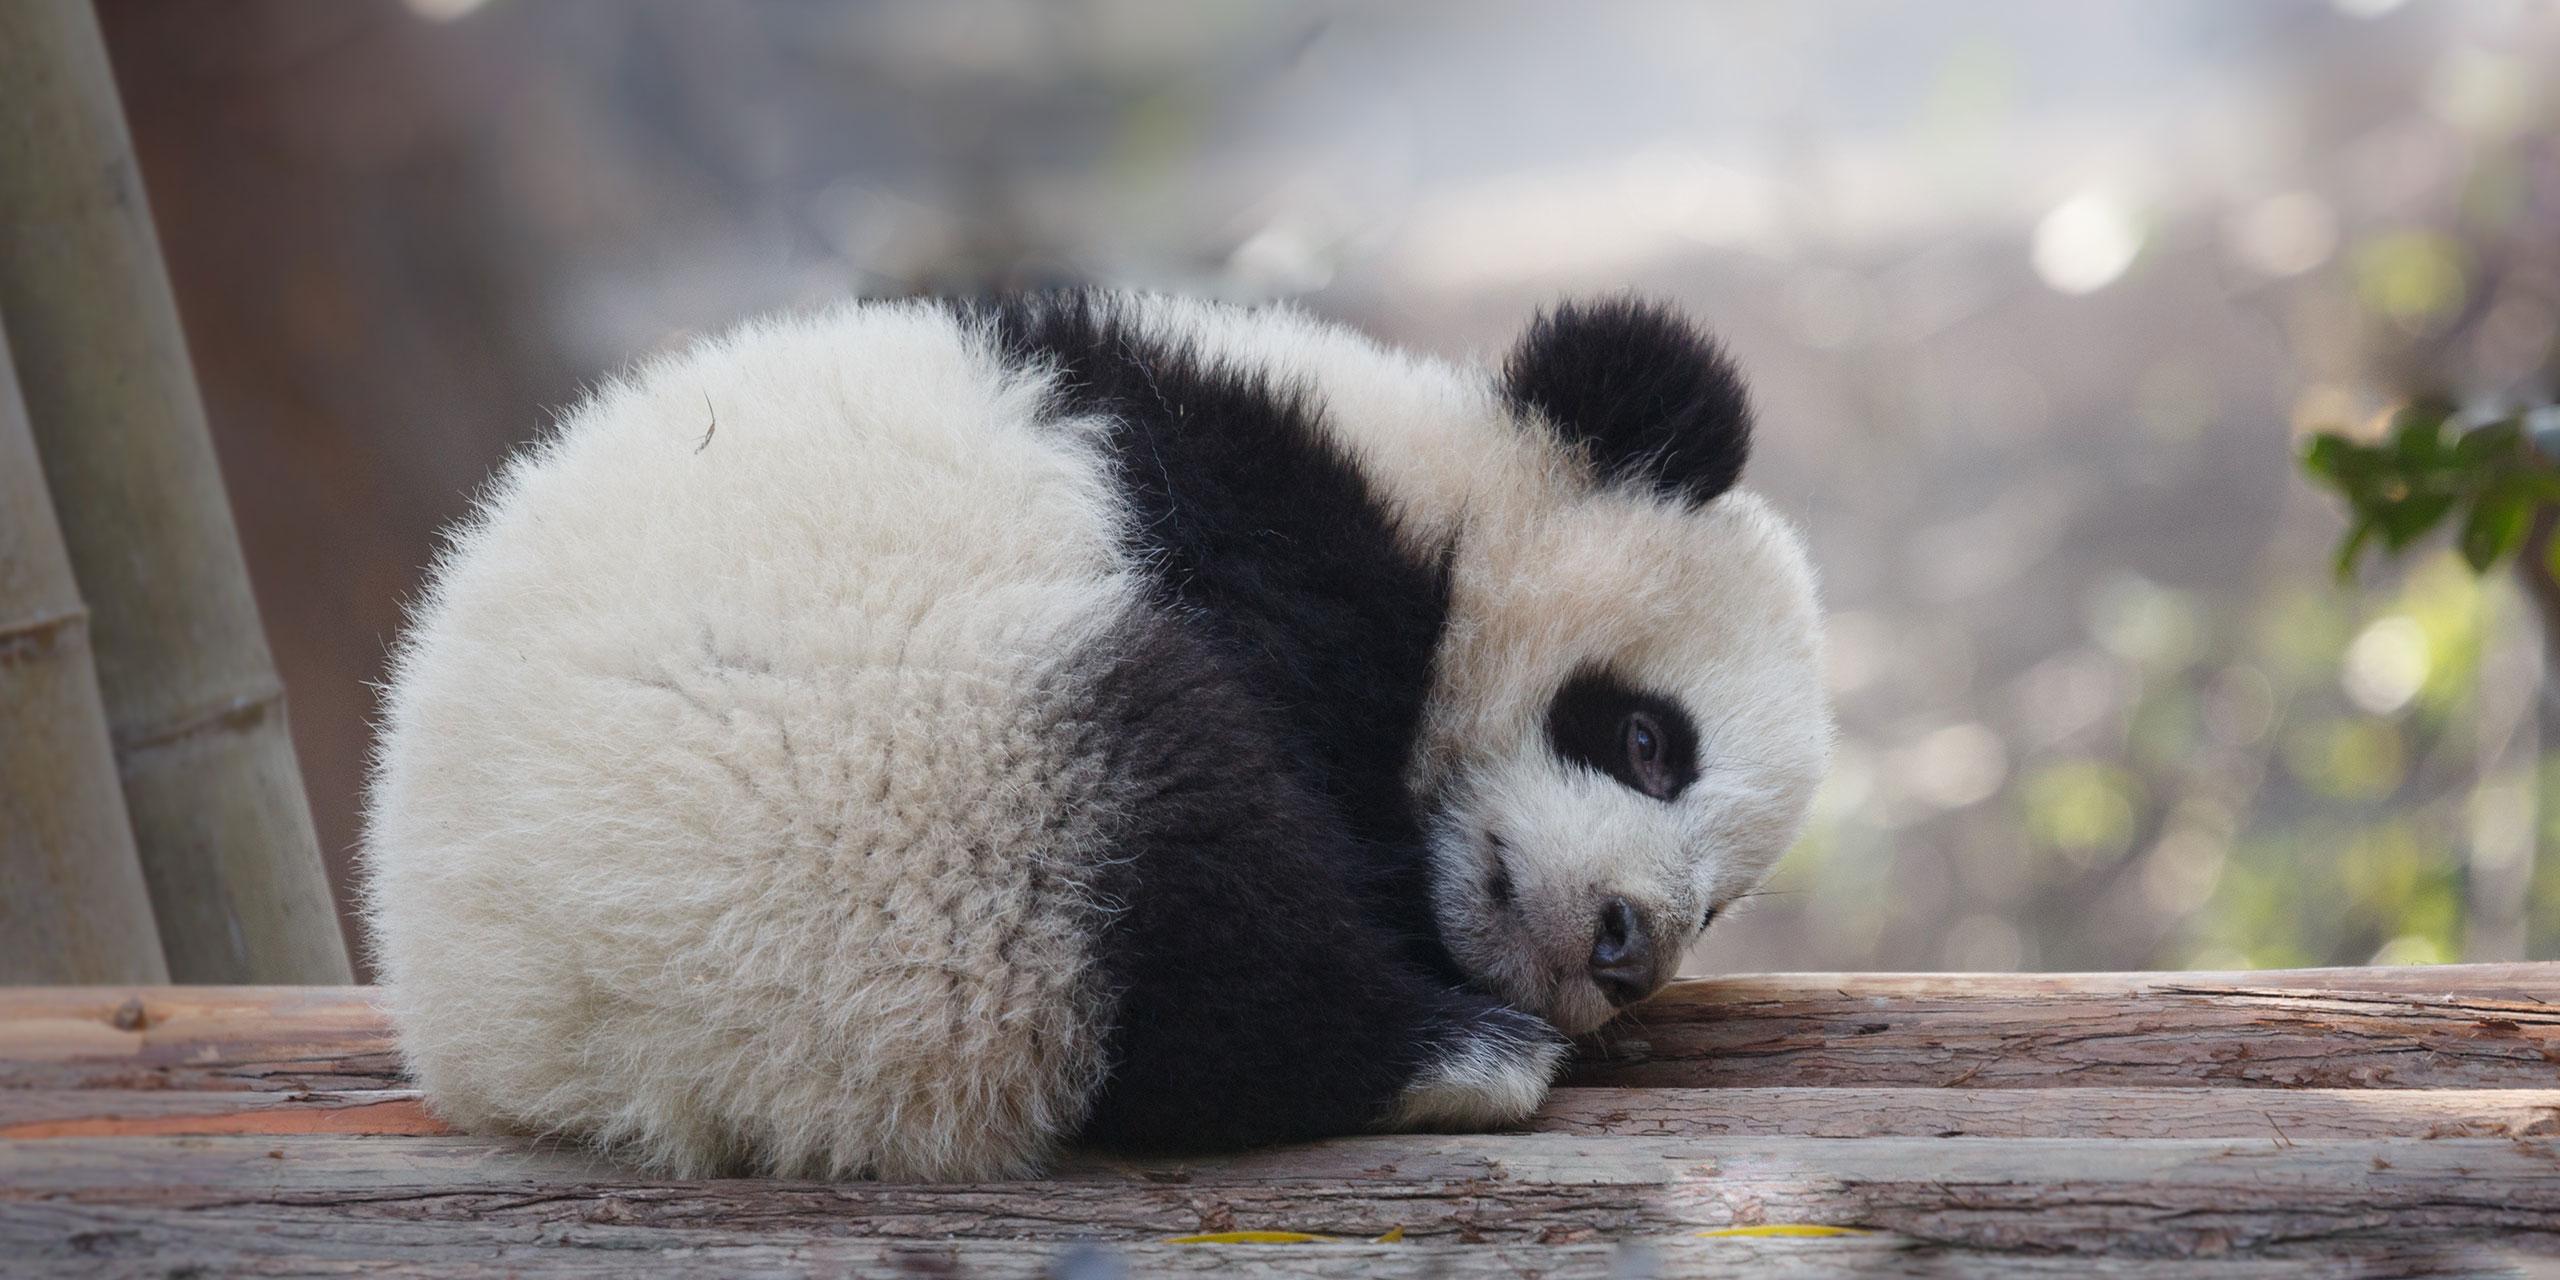 Sleeping Panda; Courtesy of enmyo Shutterstock.com